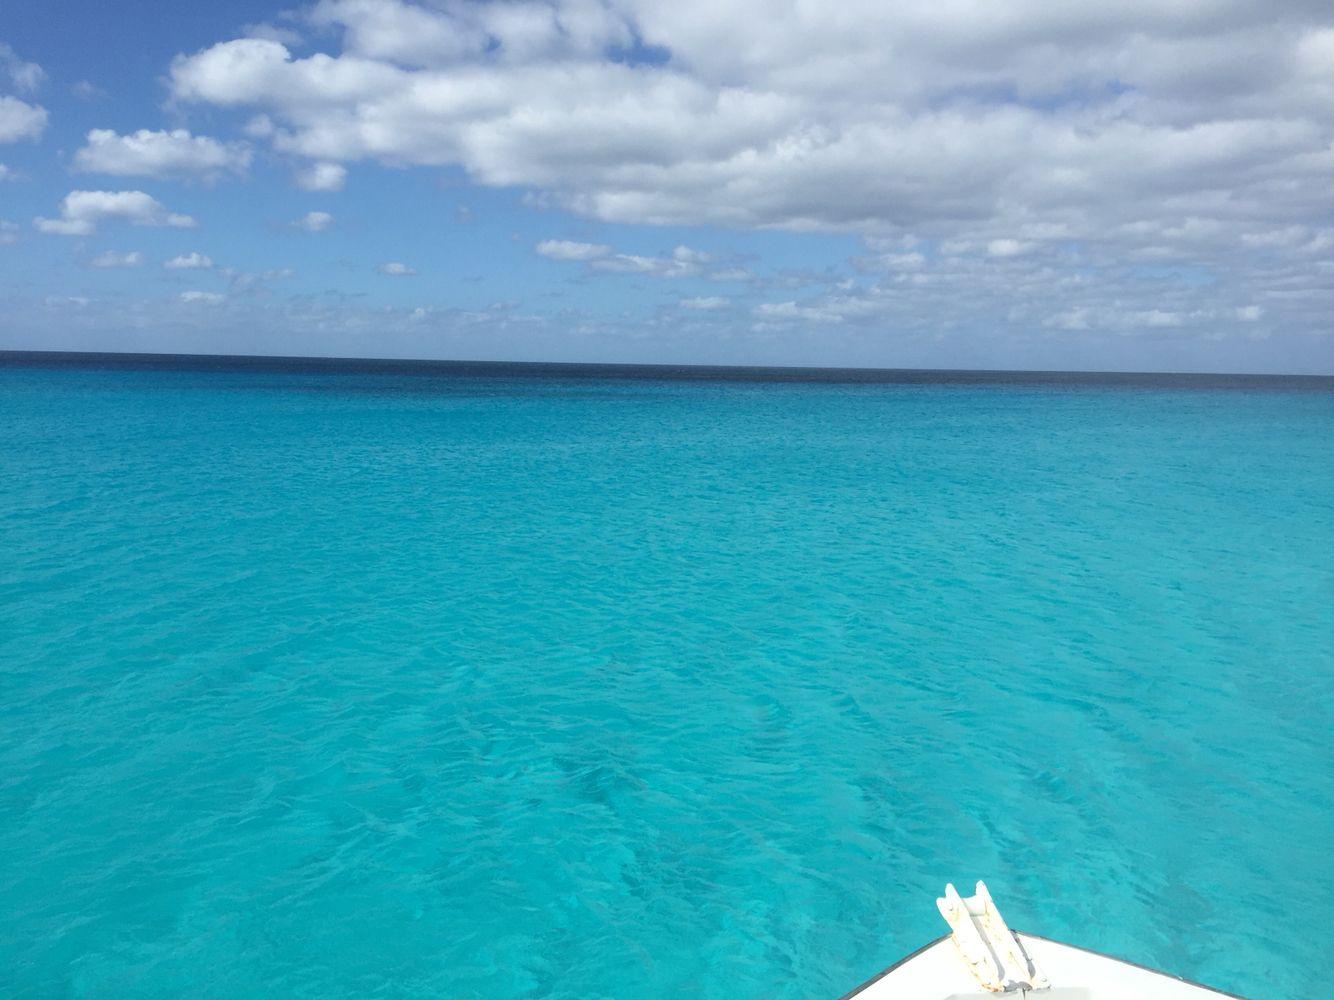 Bahamas club med plongée